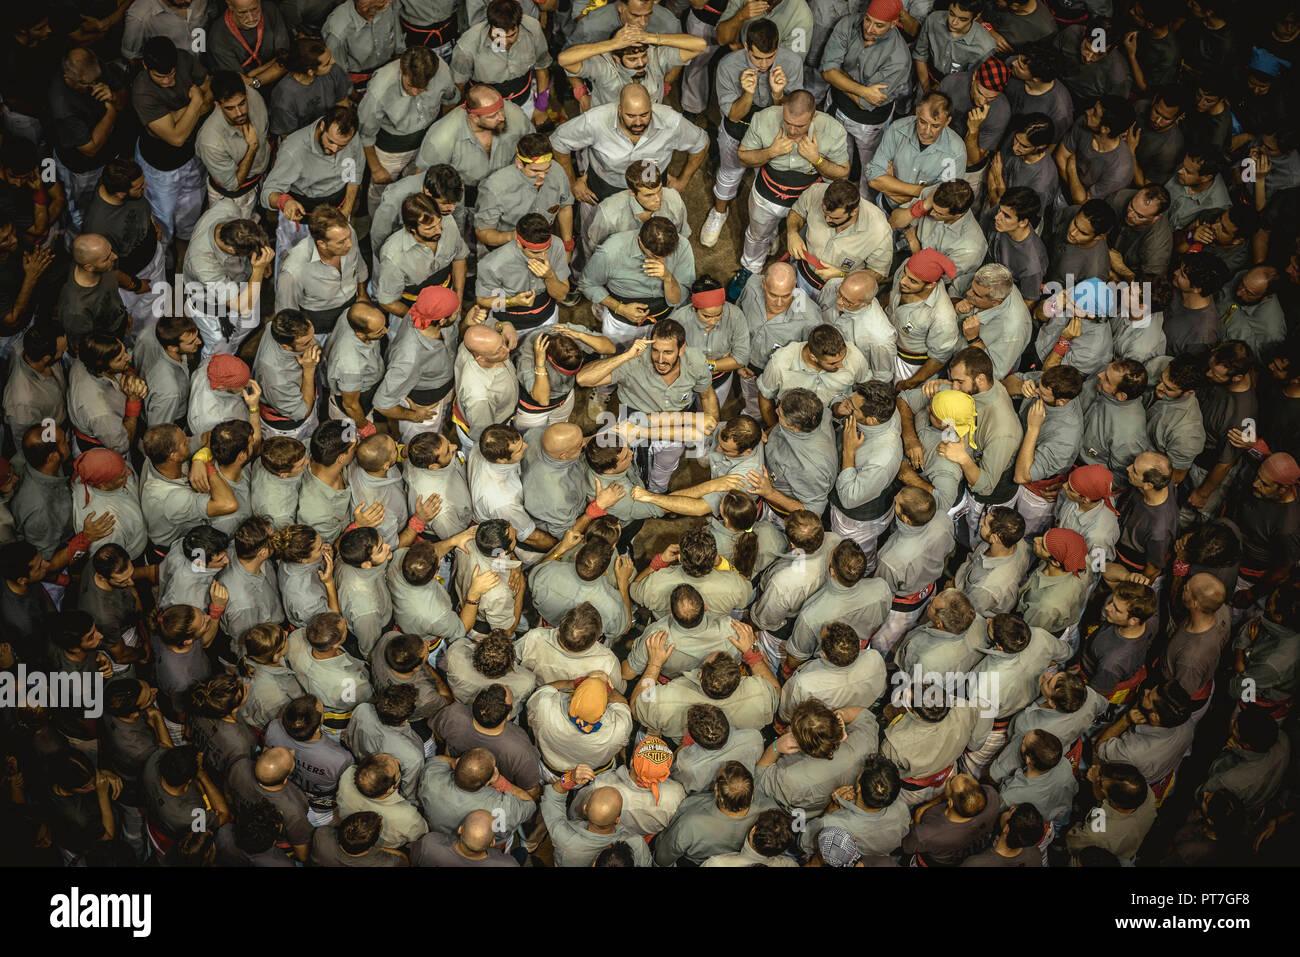 Barcelona, Spain  7th Oct 2018  The 'Castellers de Sants